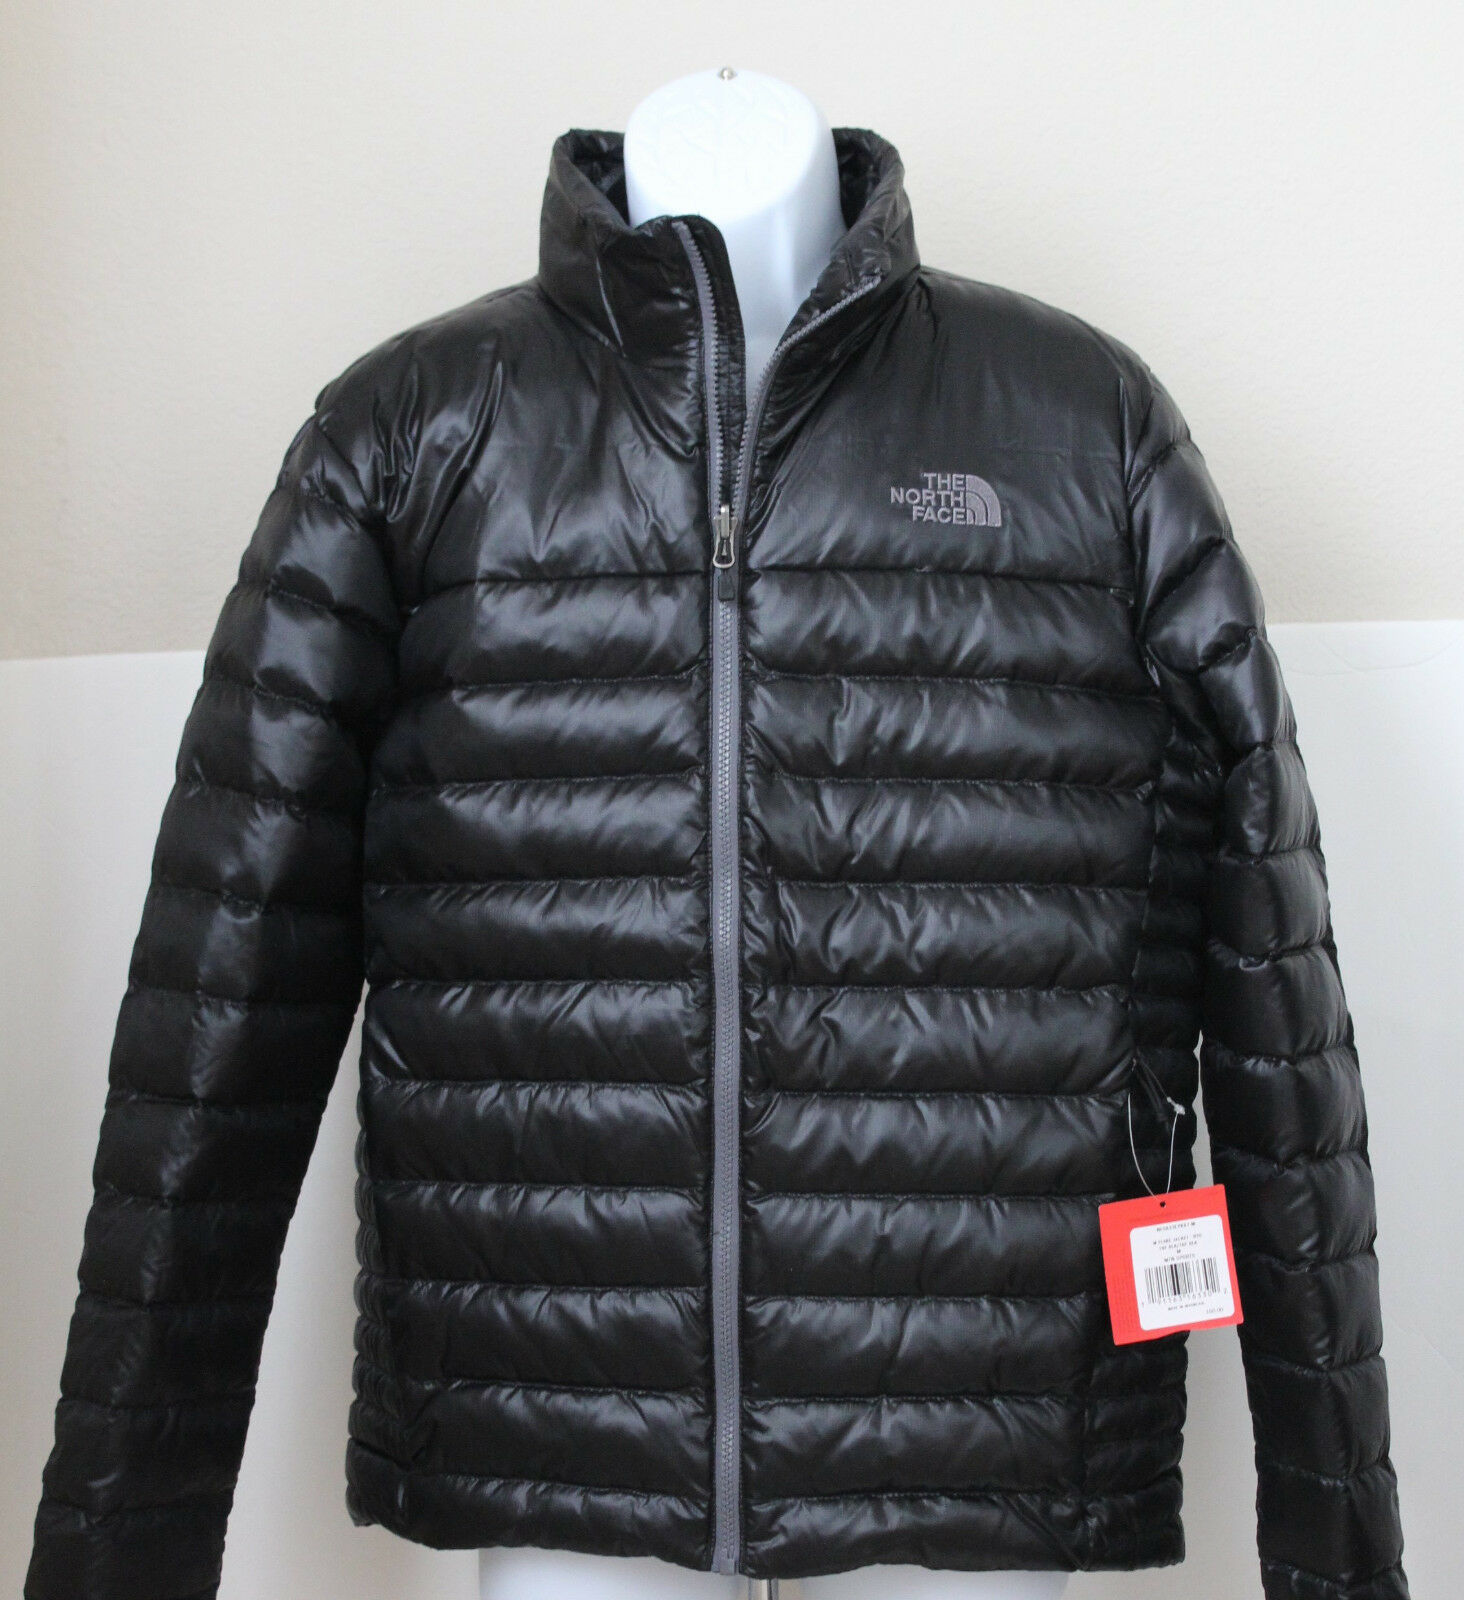 a370f951b NWT The North Face Men's Flare Down 550 RTO Ski Jacket Puffer Black  M,L,XL,2XL